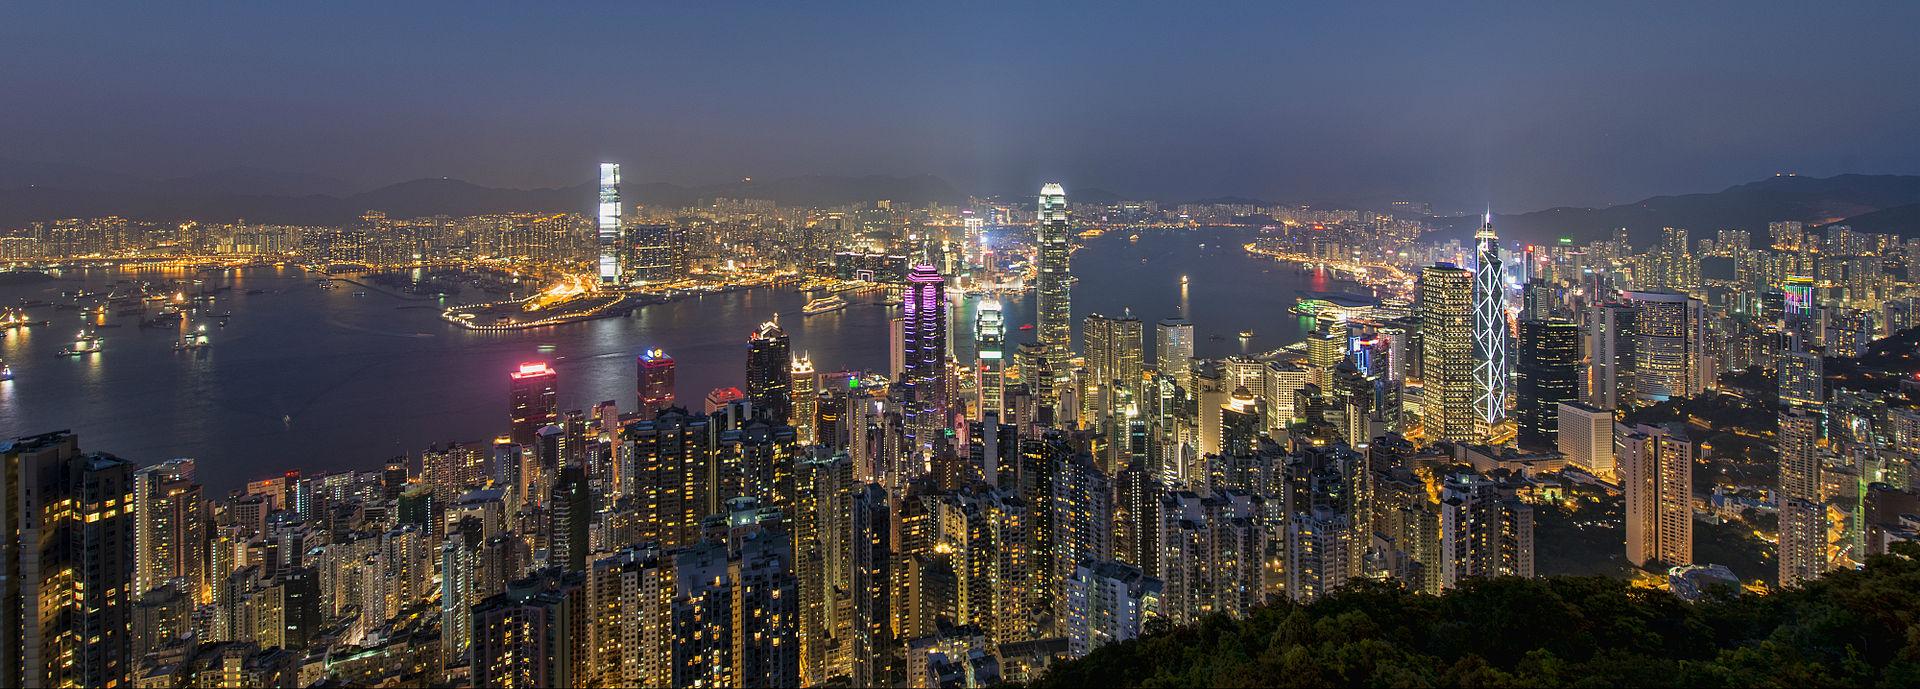 Vista panorâmica de Hong Kong. / Wikimedia commons